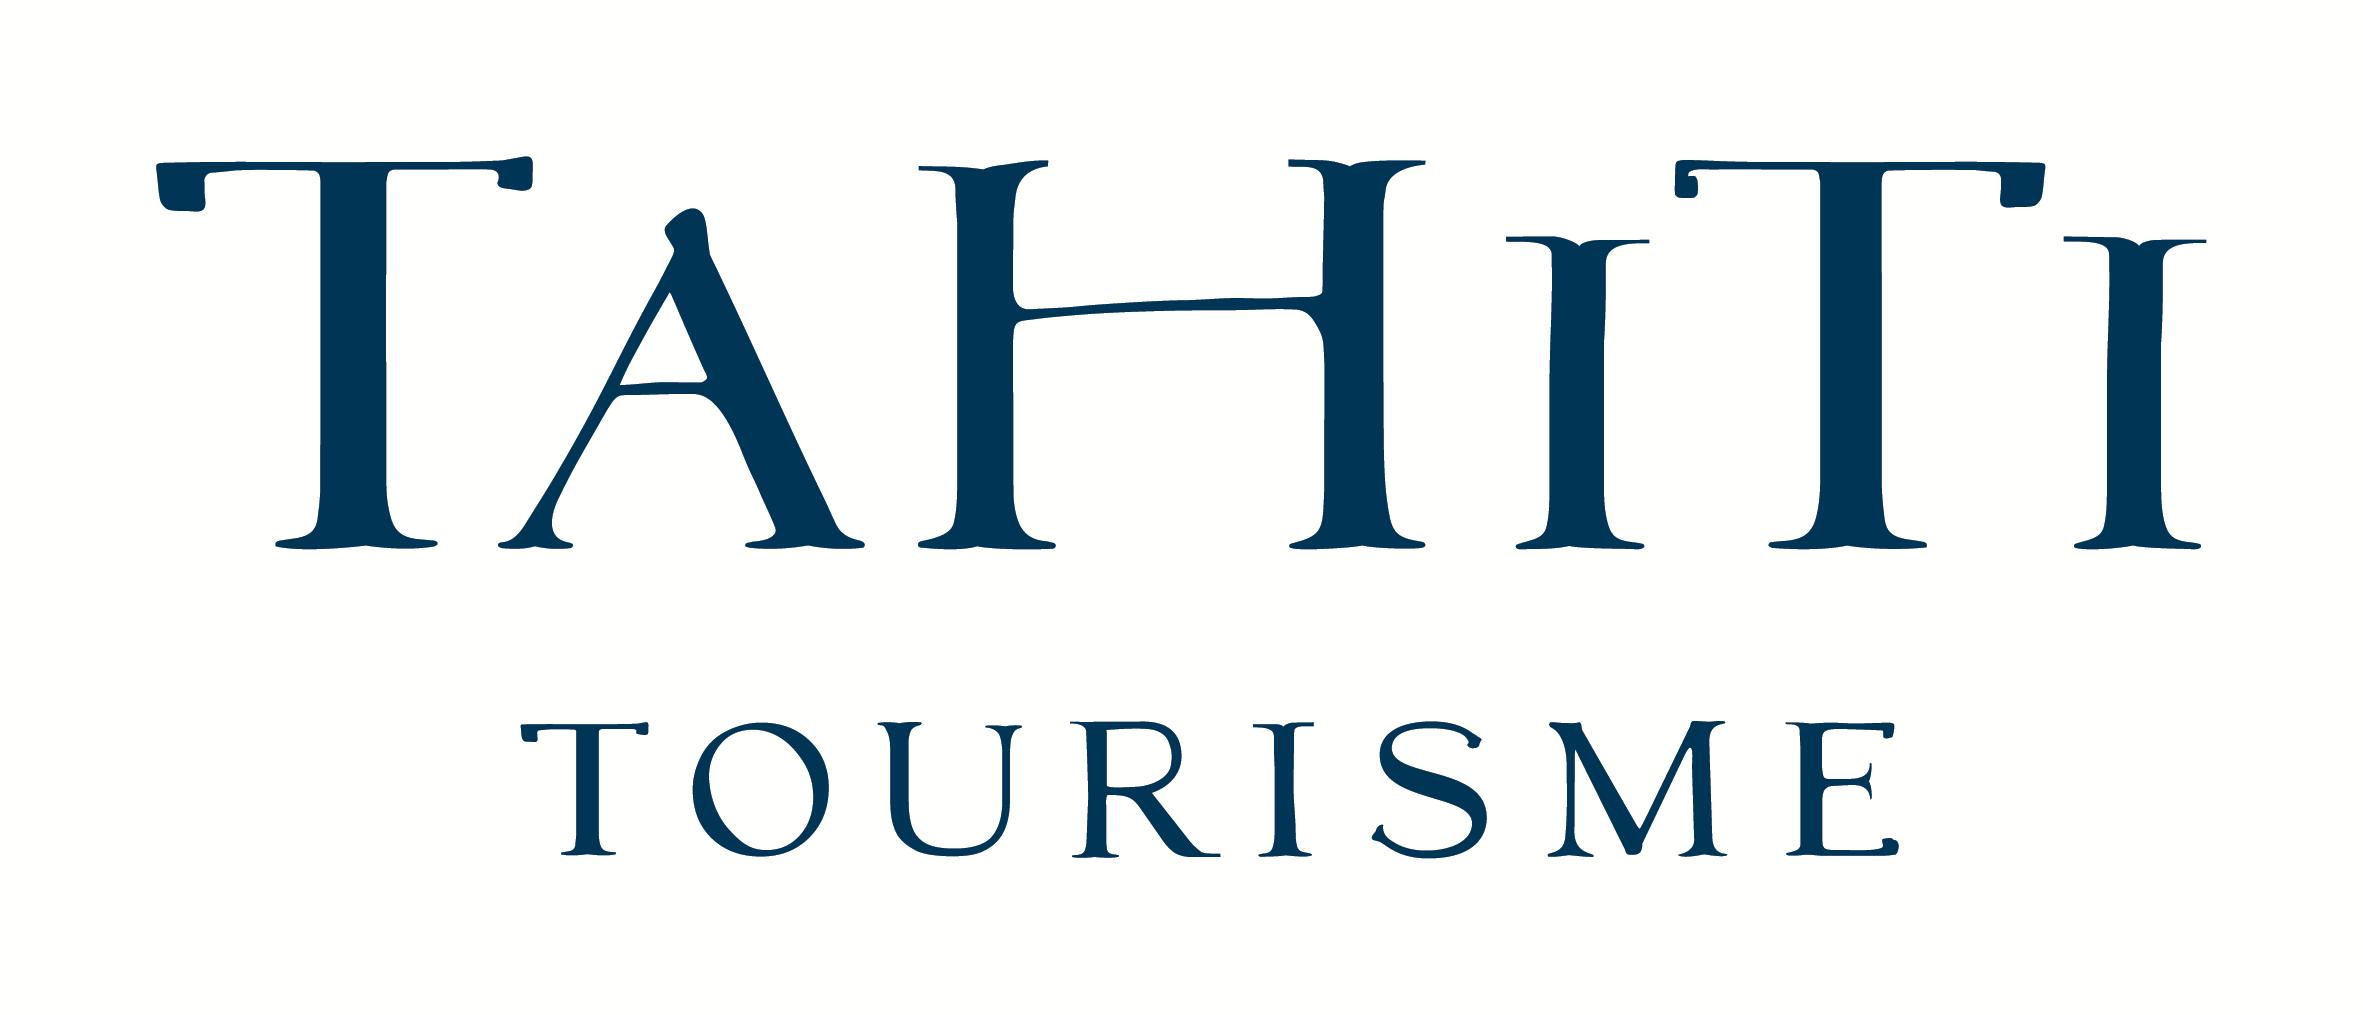 Tahiti Tourisme